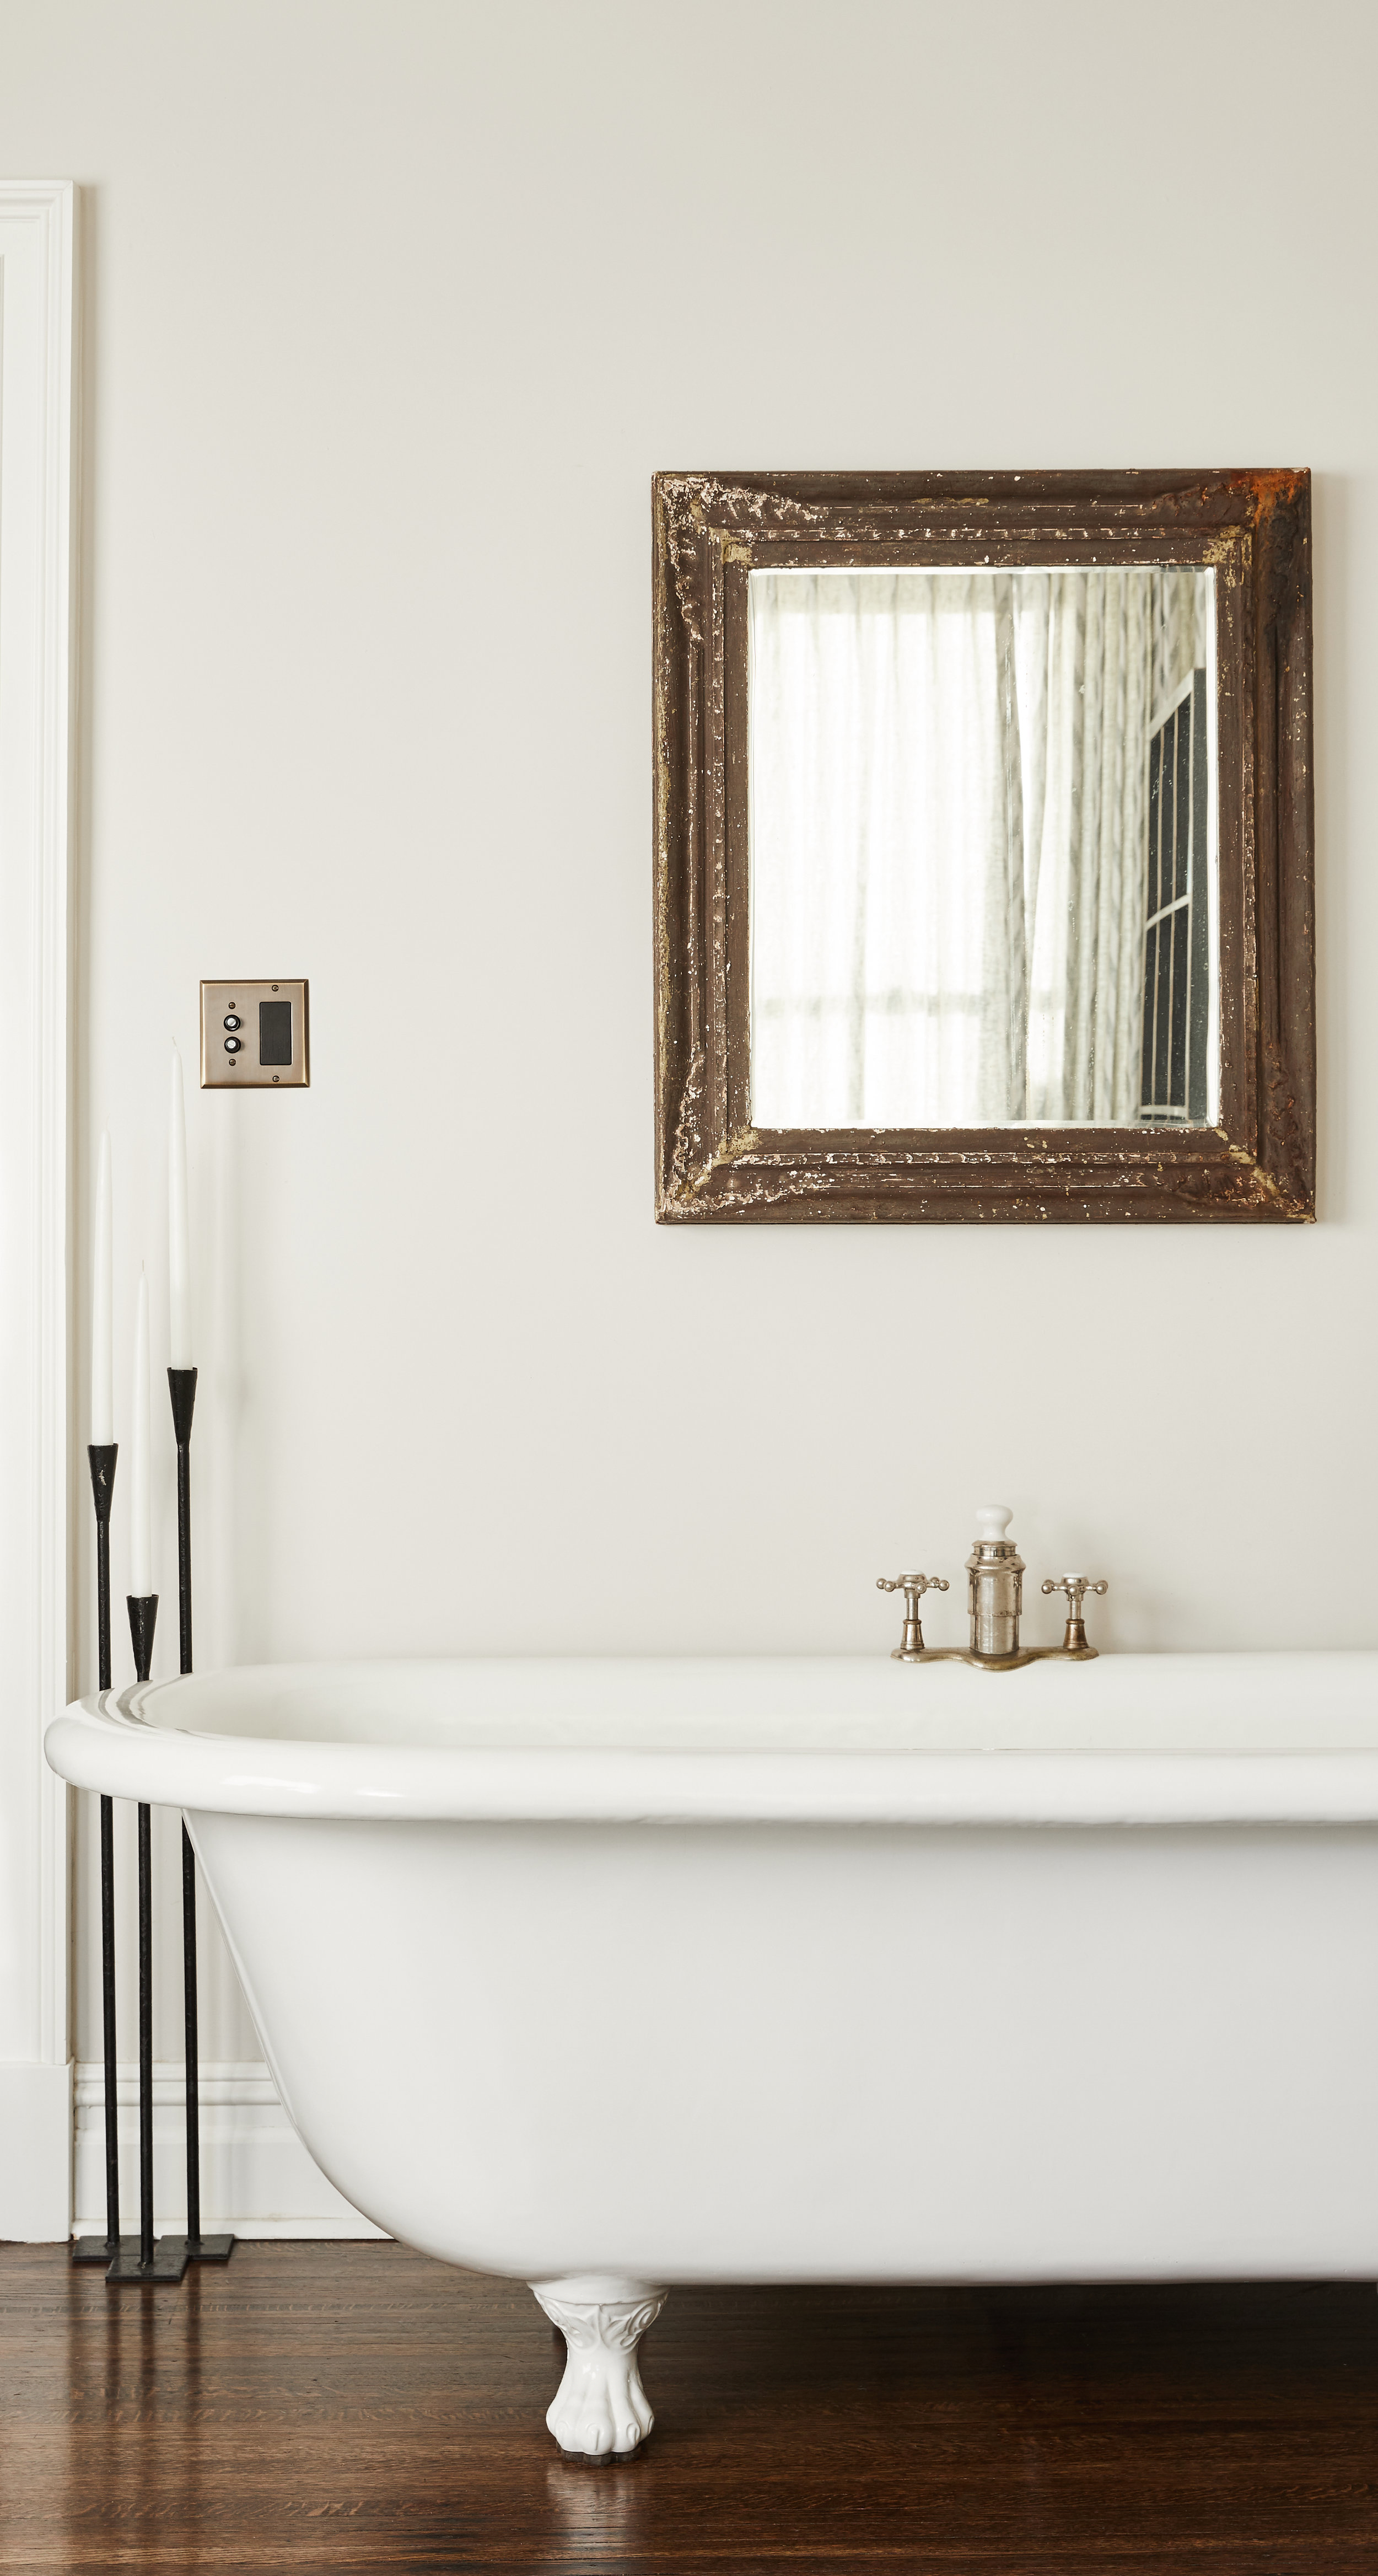 LAVA-INTERIORS-BROOKLYN-TOWNHOUSE-MASTER-SITTING-ROOM-BATHROOM-CLAWFOOT-TUB.jpg